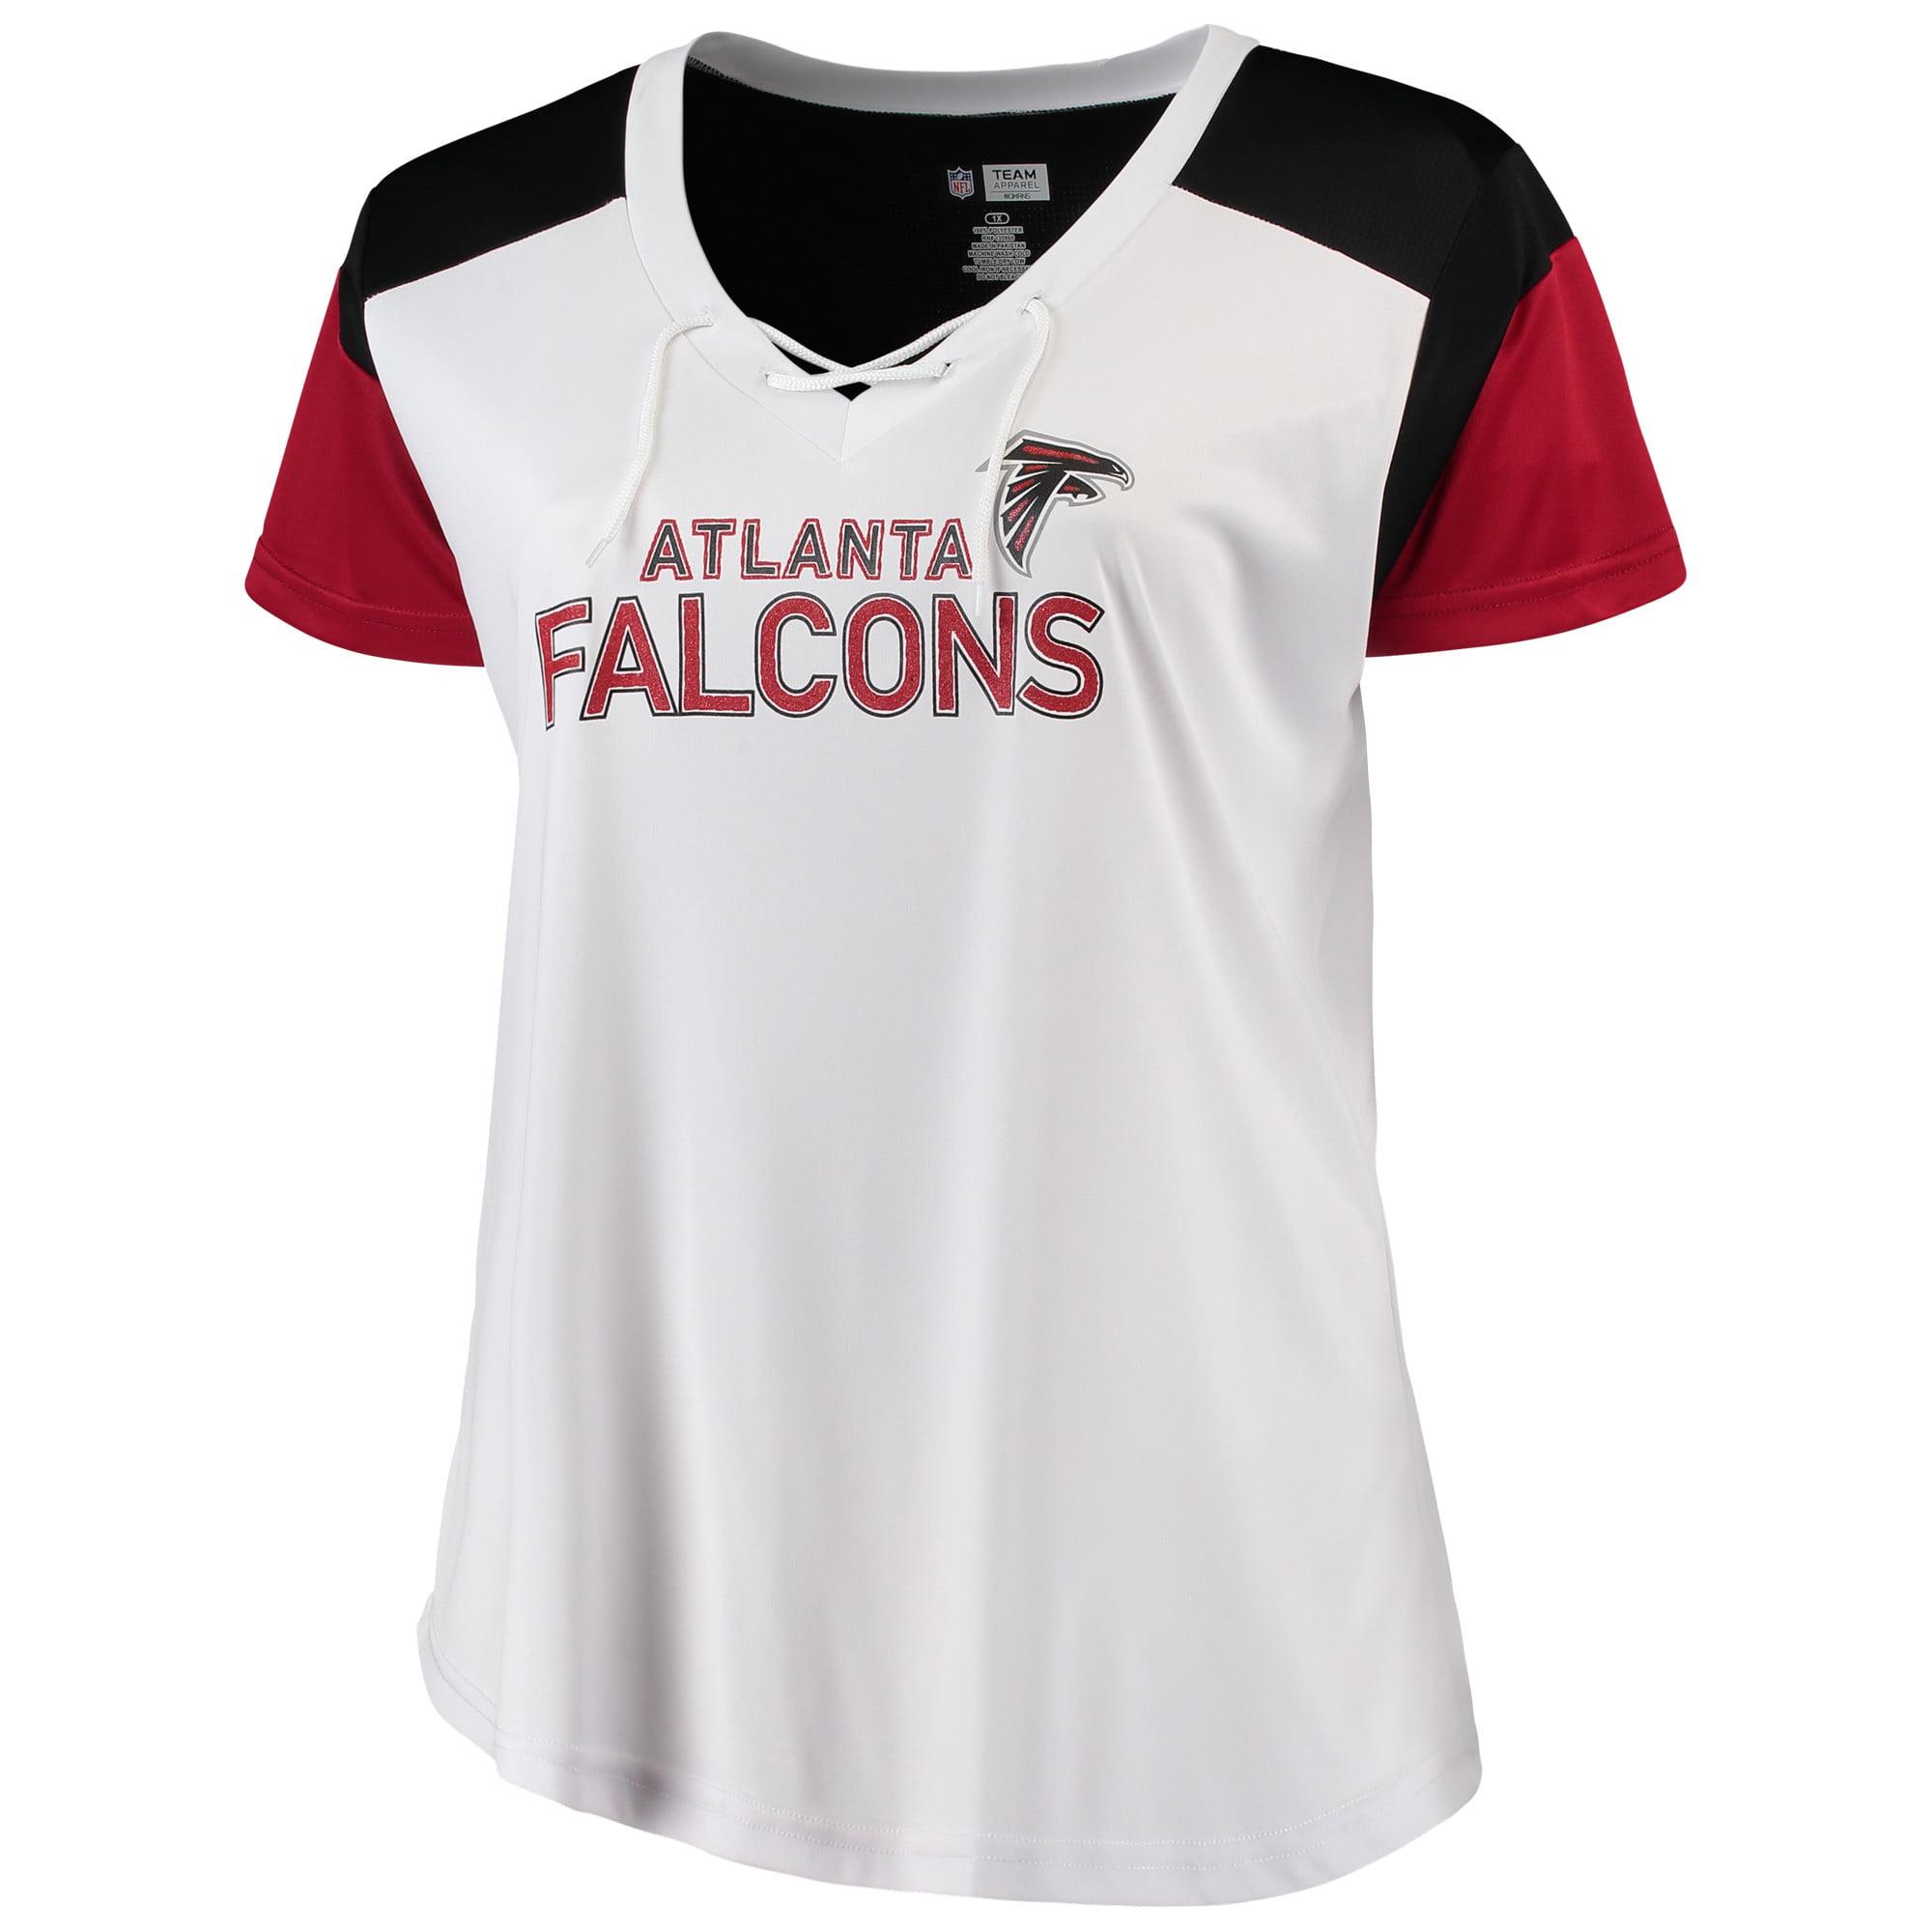 Women's Majestic White/Red Atlanta Falcons Lace-Up V-Neck T-Shirt